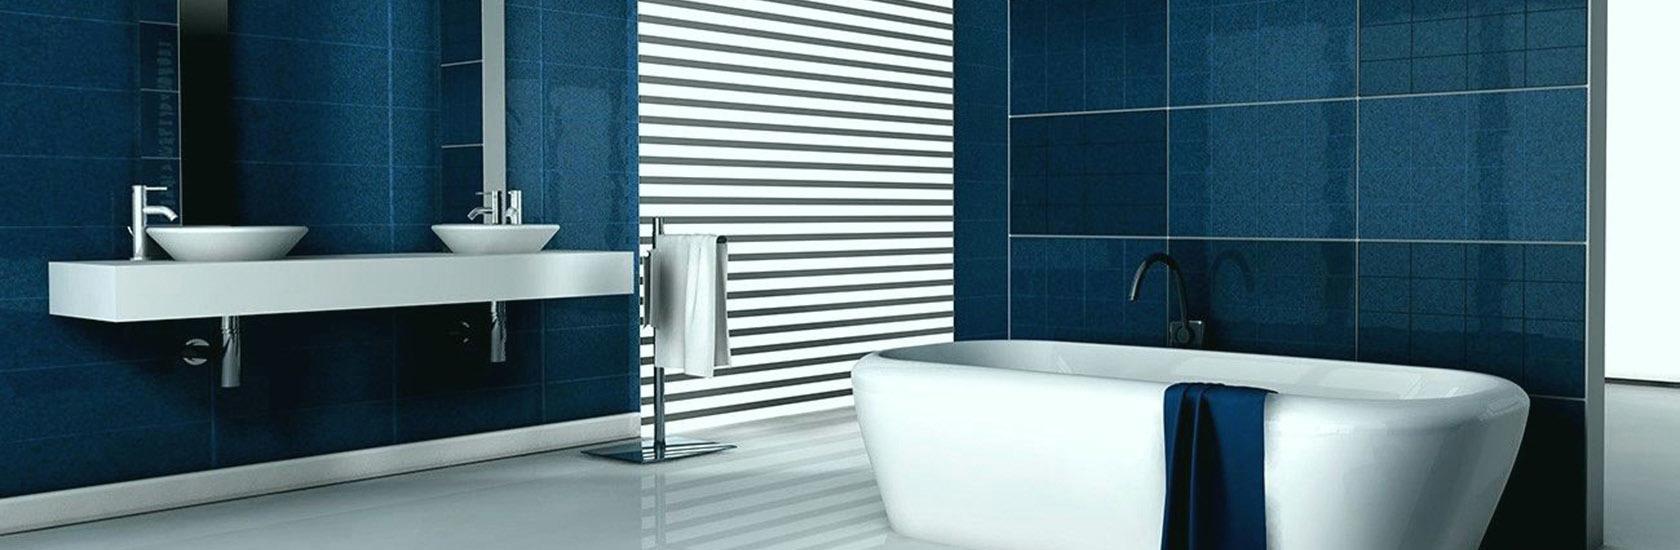 Bathroom design Lower hutt Shower installation Wellington